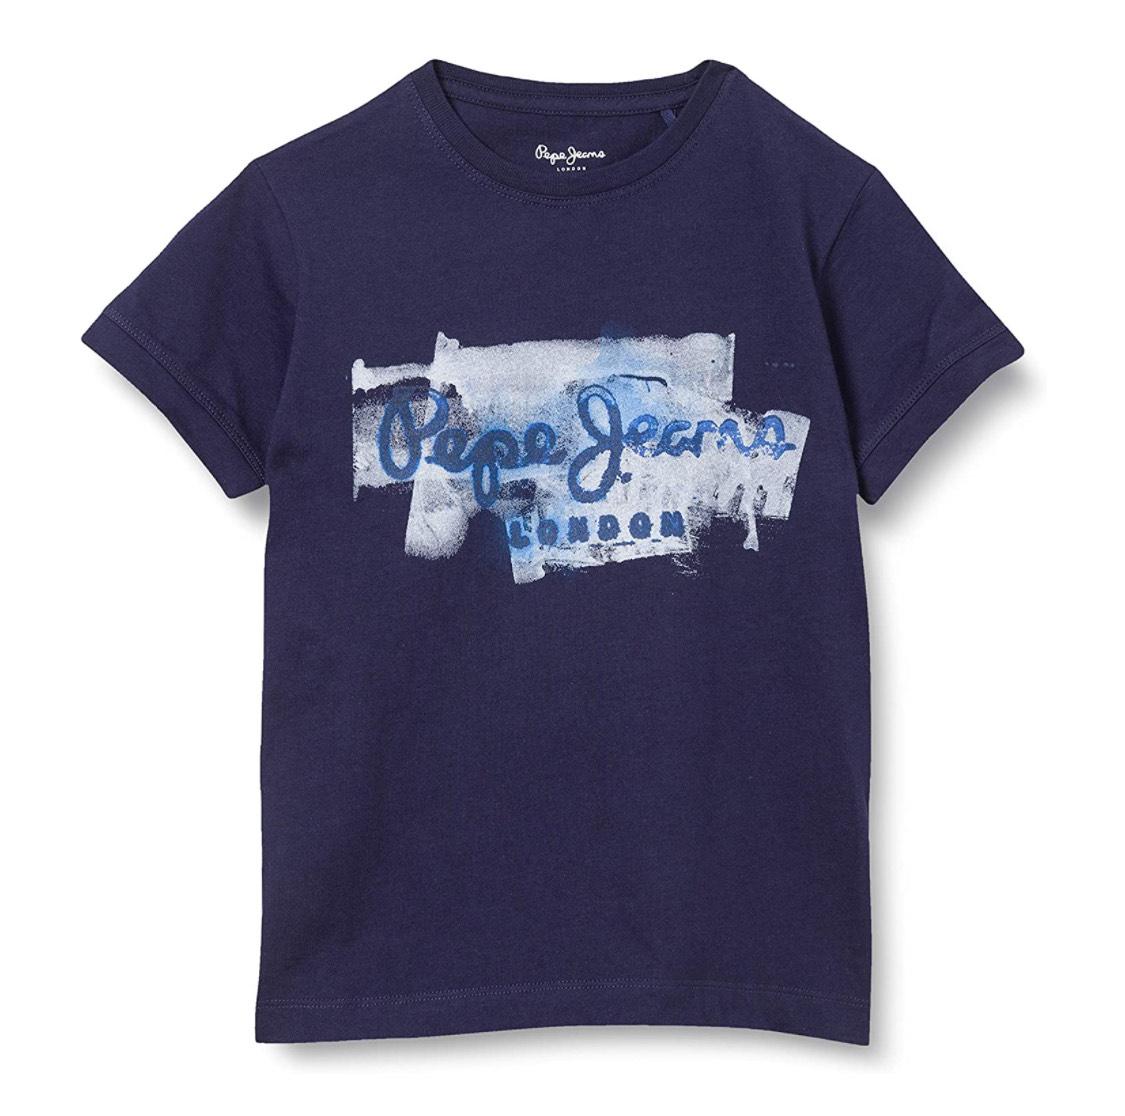 Camiseta infantil Pepe Jeans talla 6.